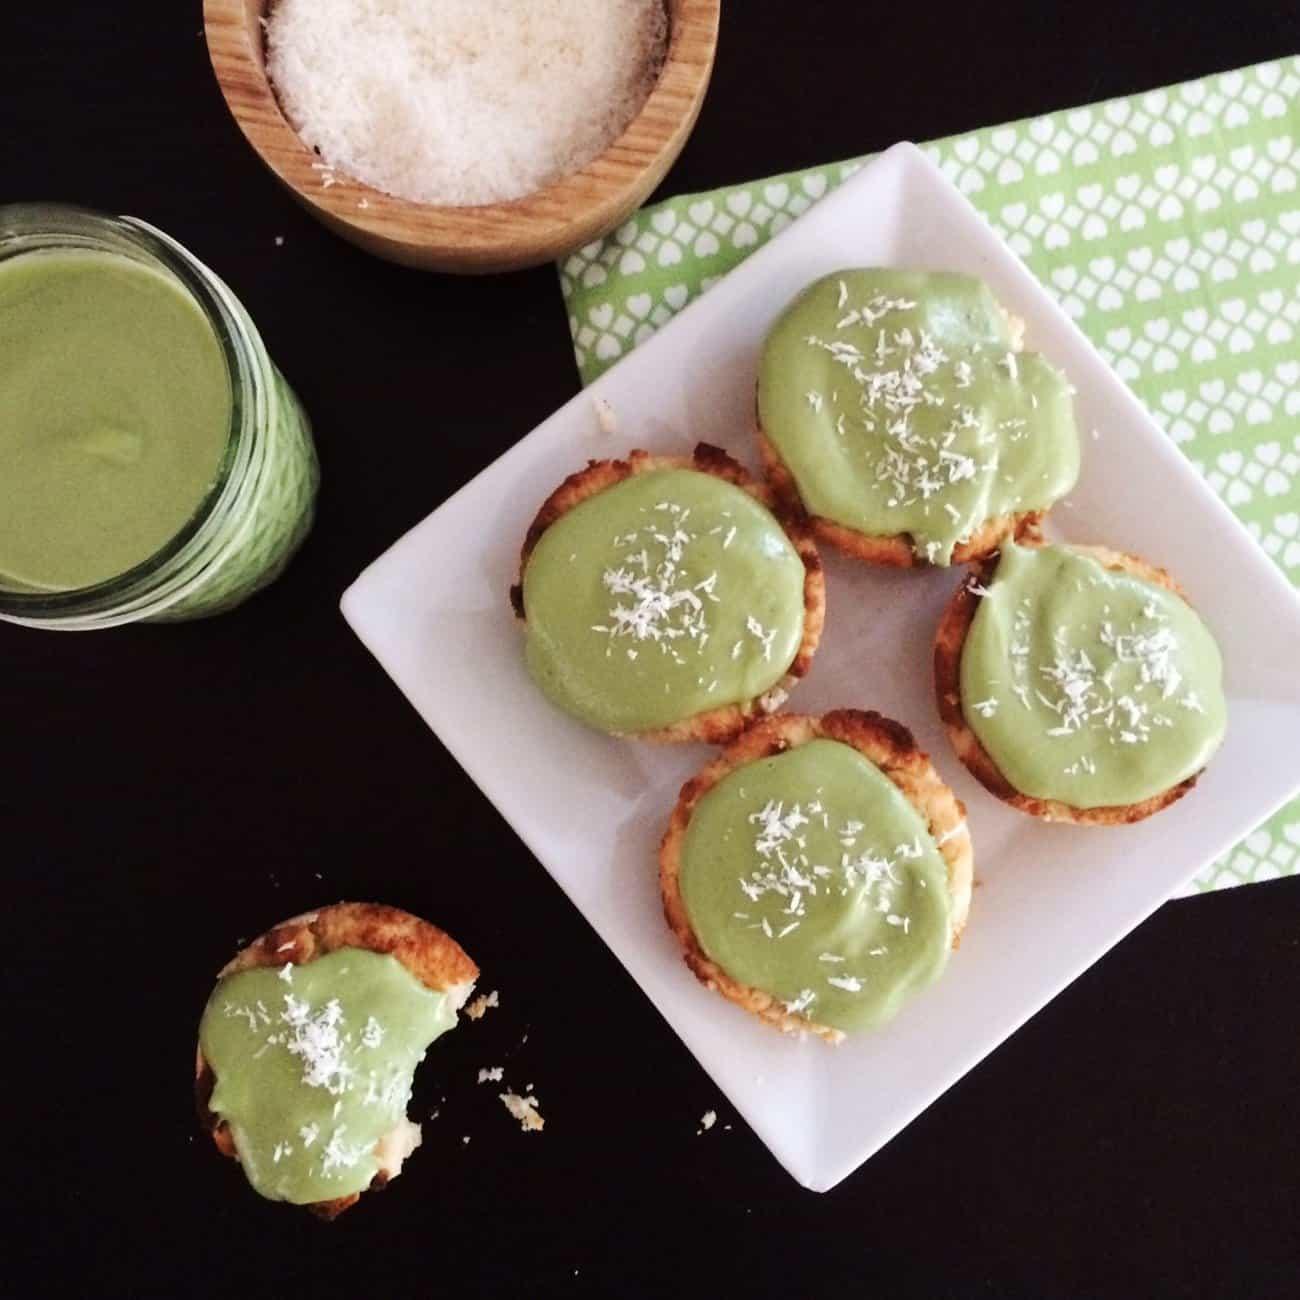 Instant-Pot-Low-Carb-Vegan-Cupcakes-Matcha-Coconut